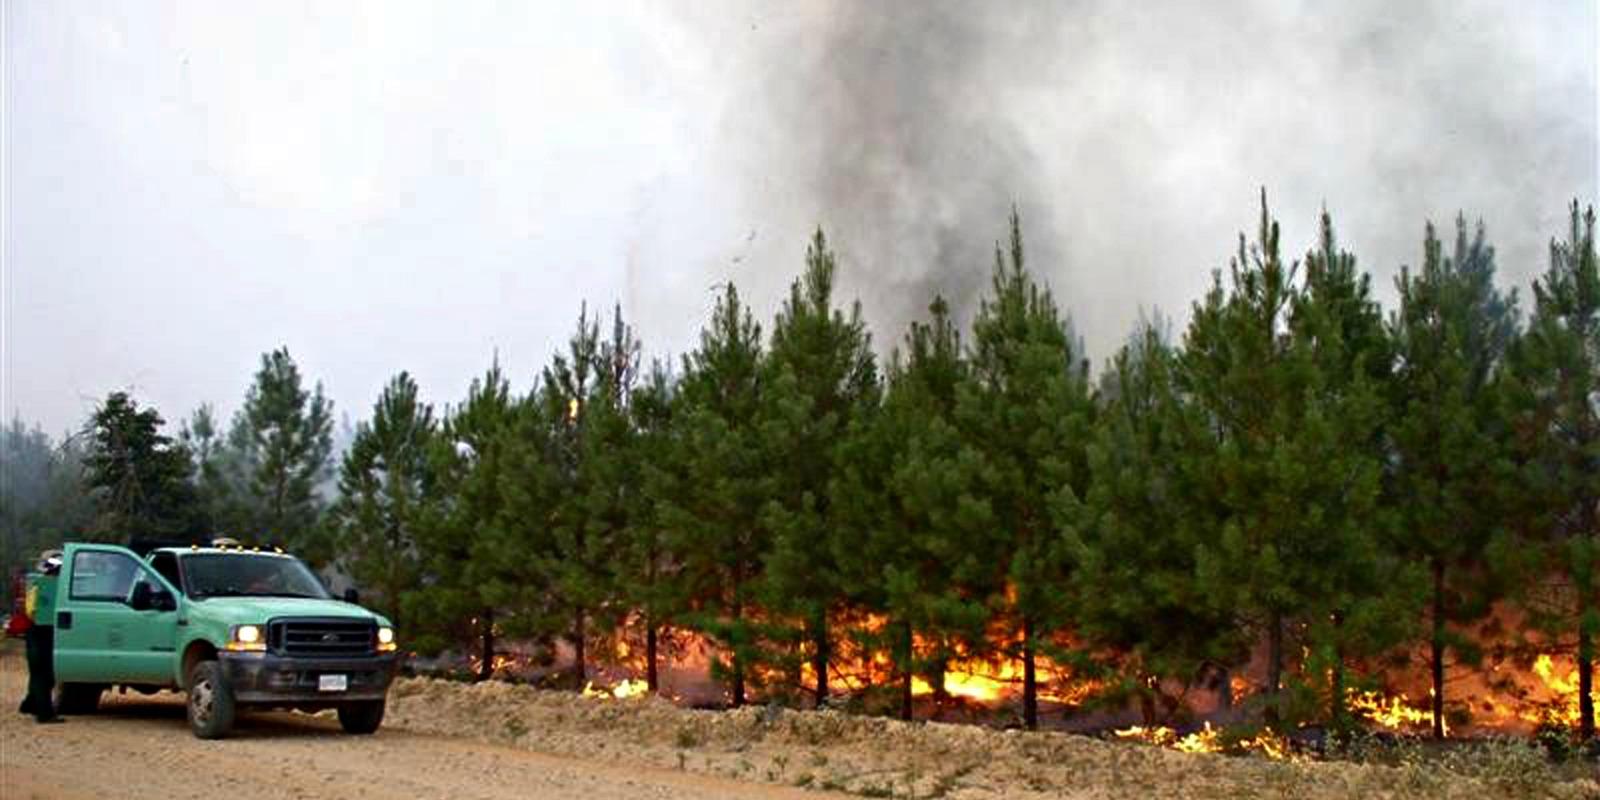 Rural Fire Defense